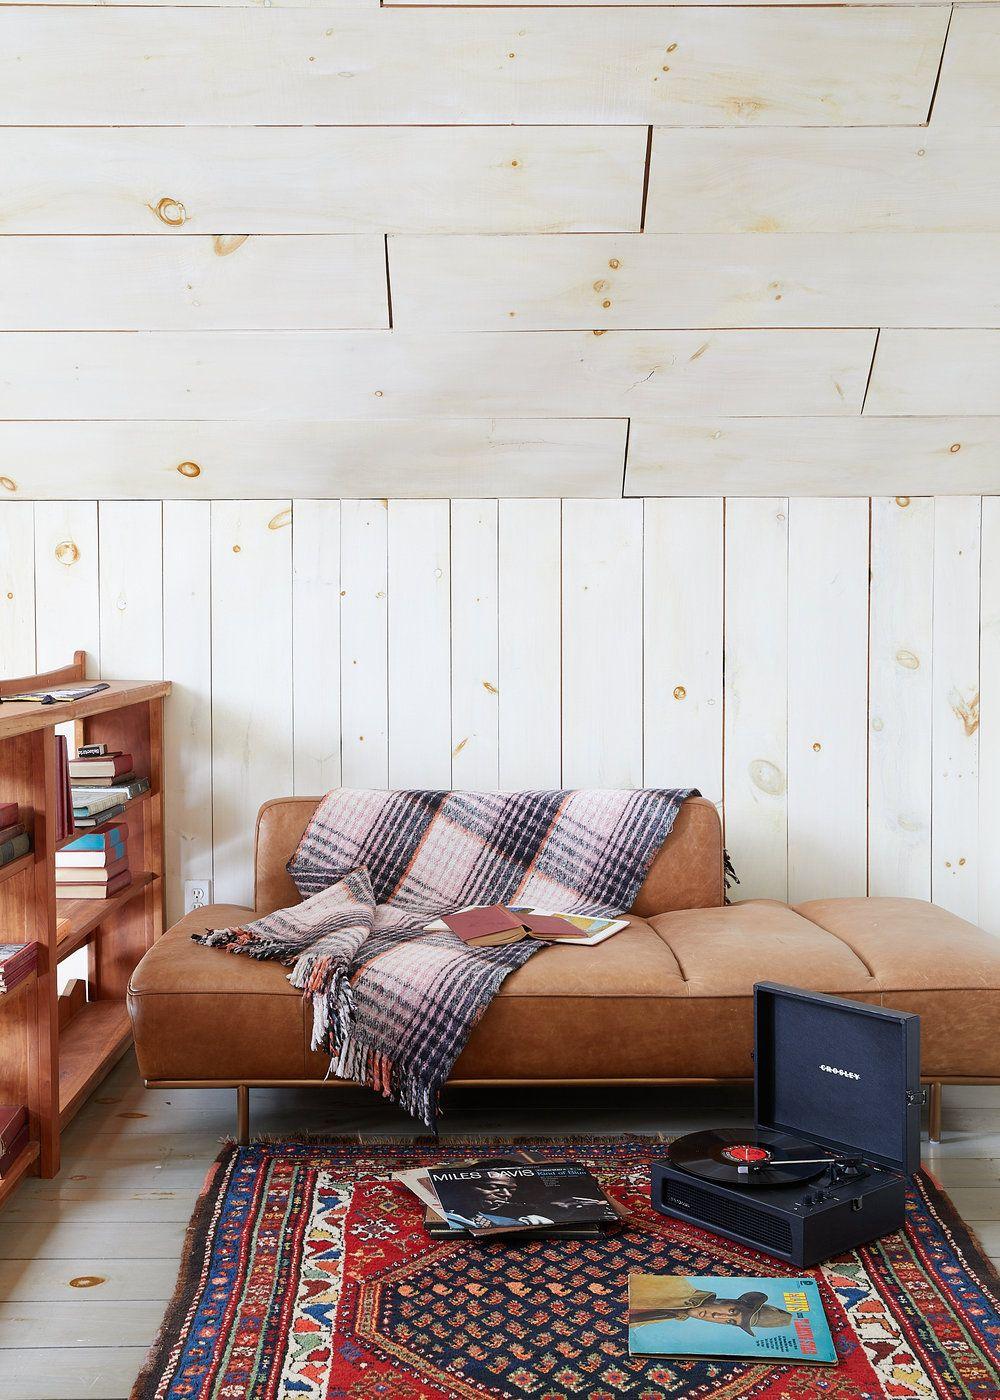 32 Chic Home Decorating Ideas   Easy Interior Design And Decor ...